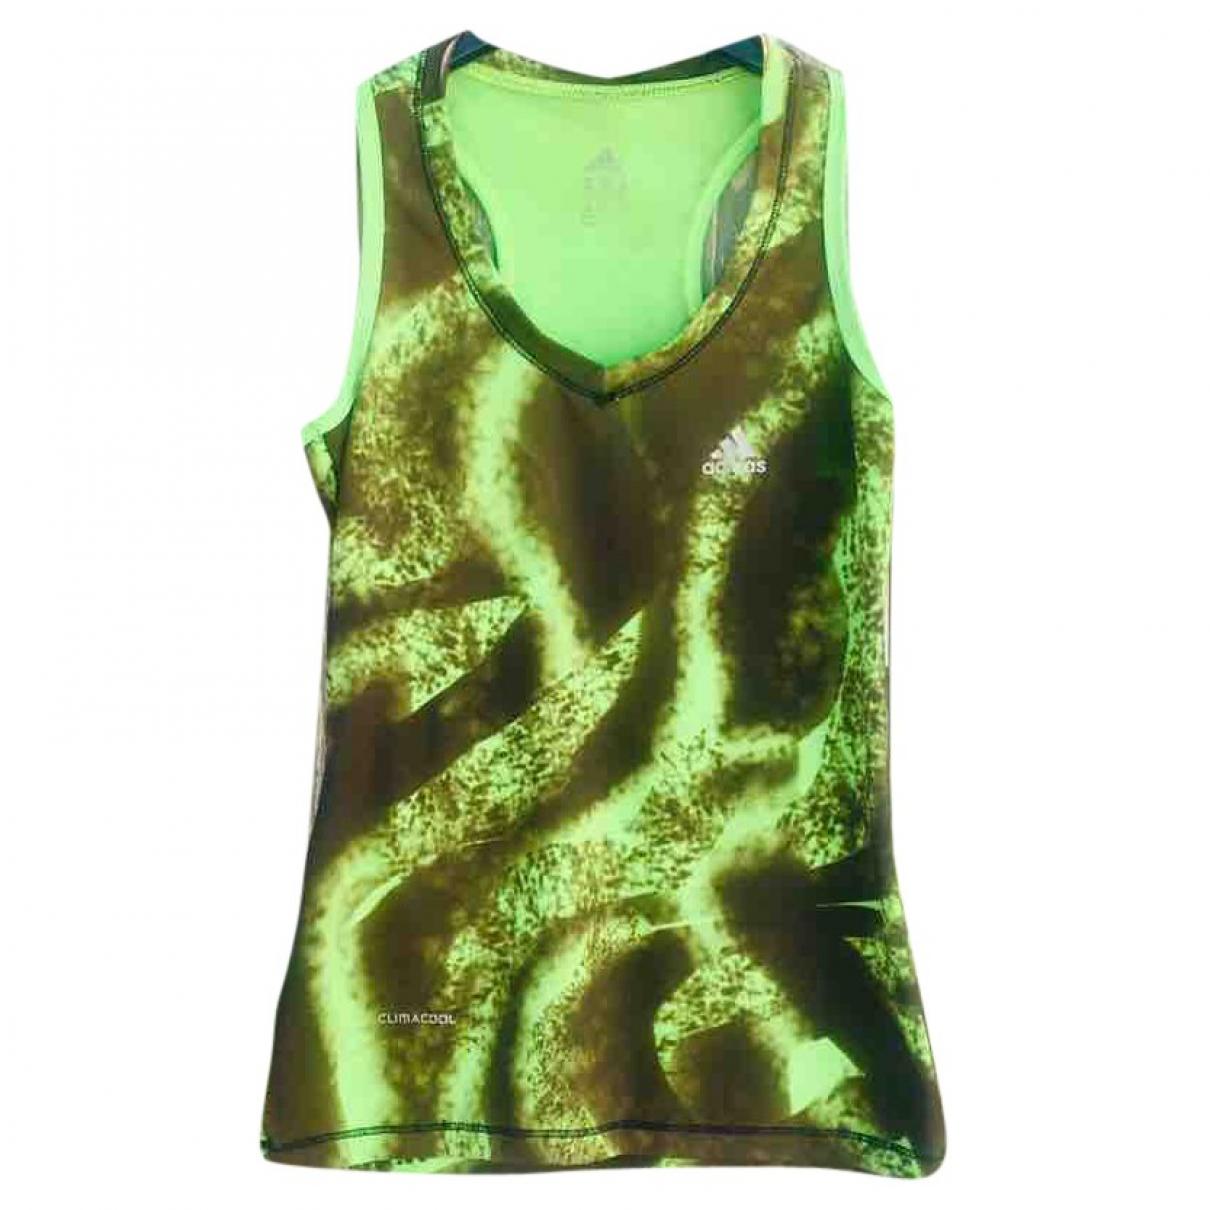 Adidas \N Green  top for Women M International